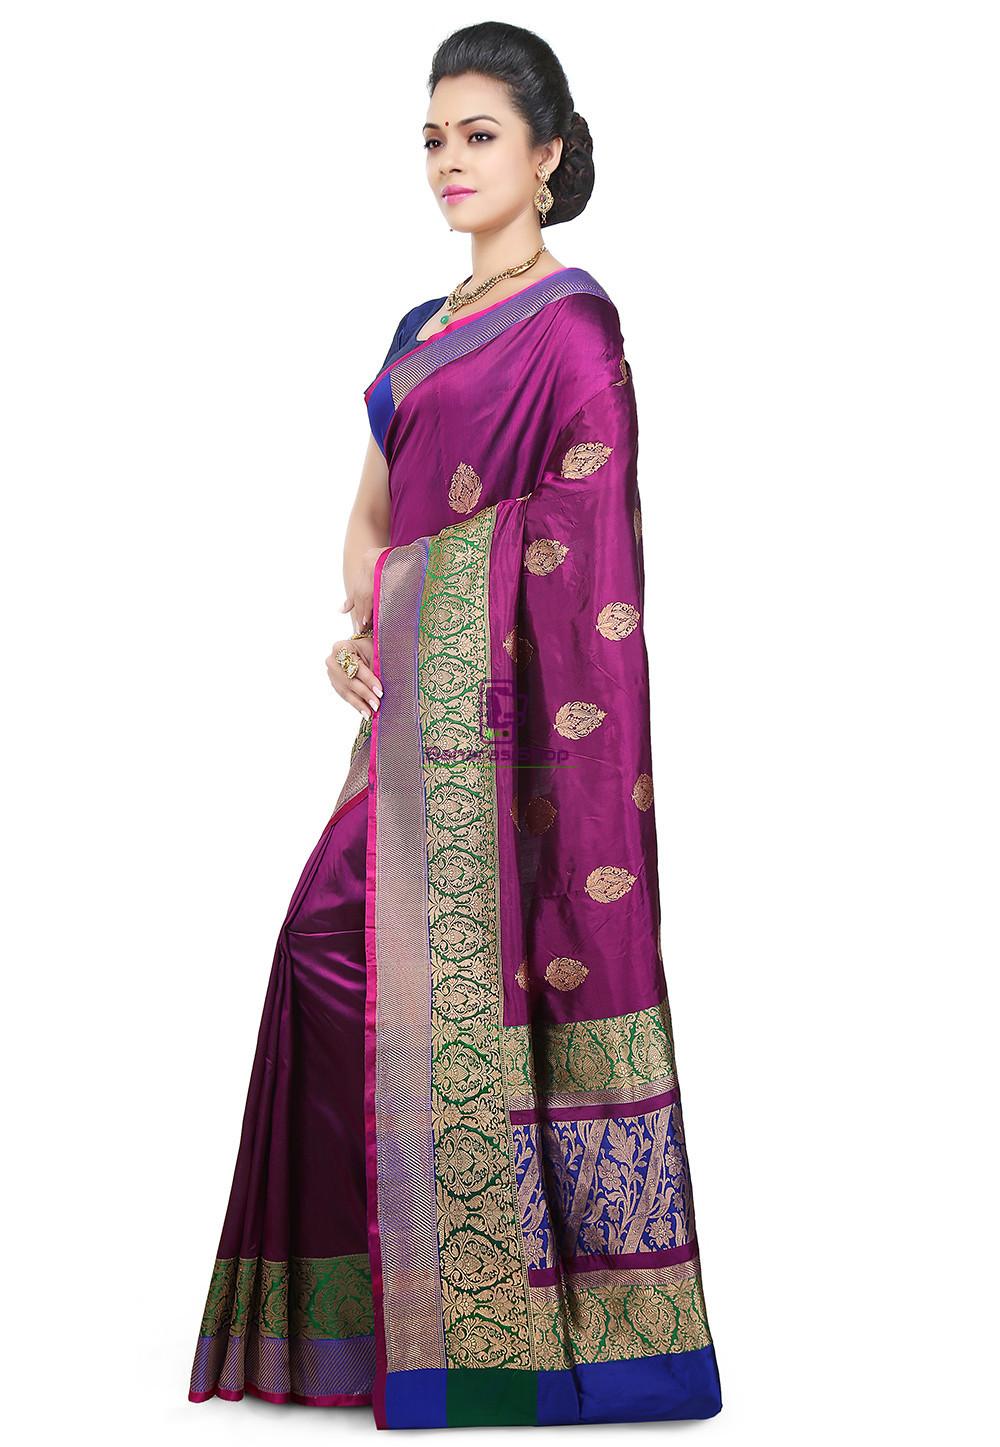 Banarasi Pure Katan Silk Handloom Saree in Purple 5